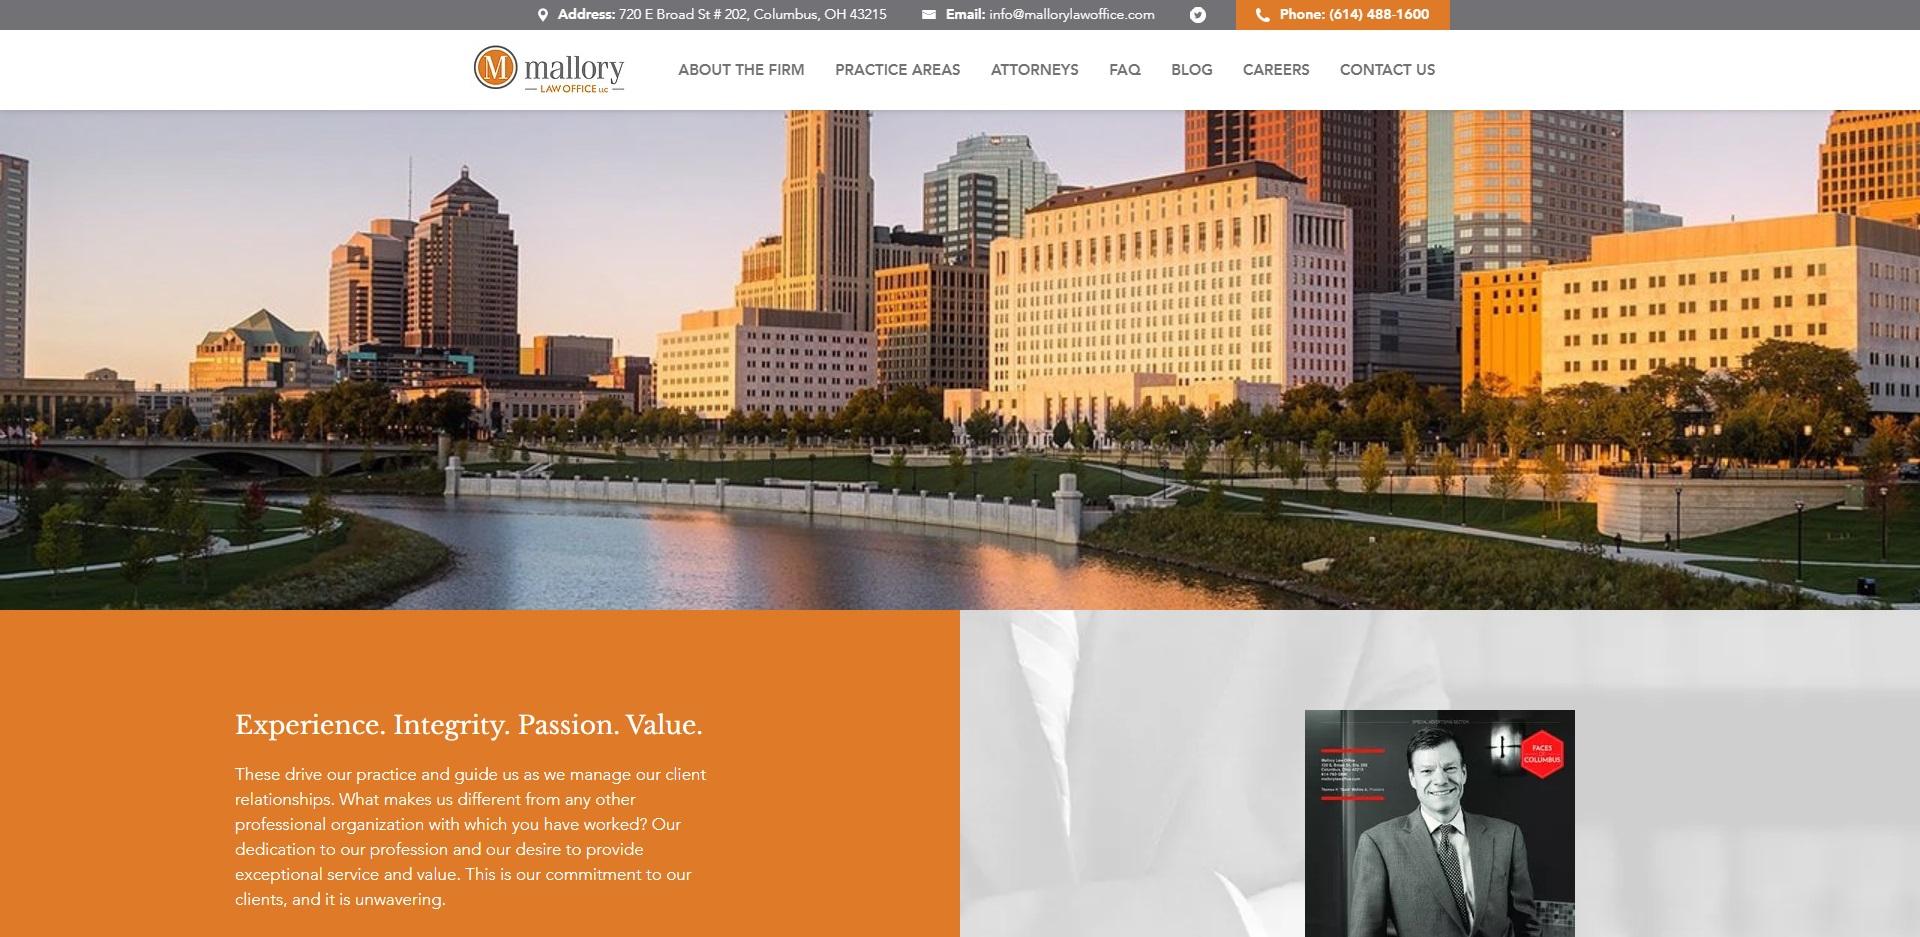 The Best Estate Attorneys in Columbus